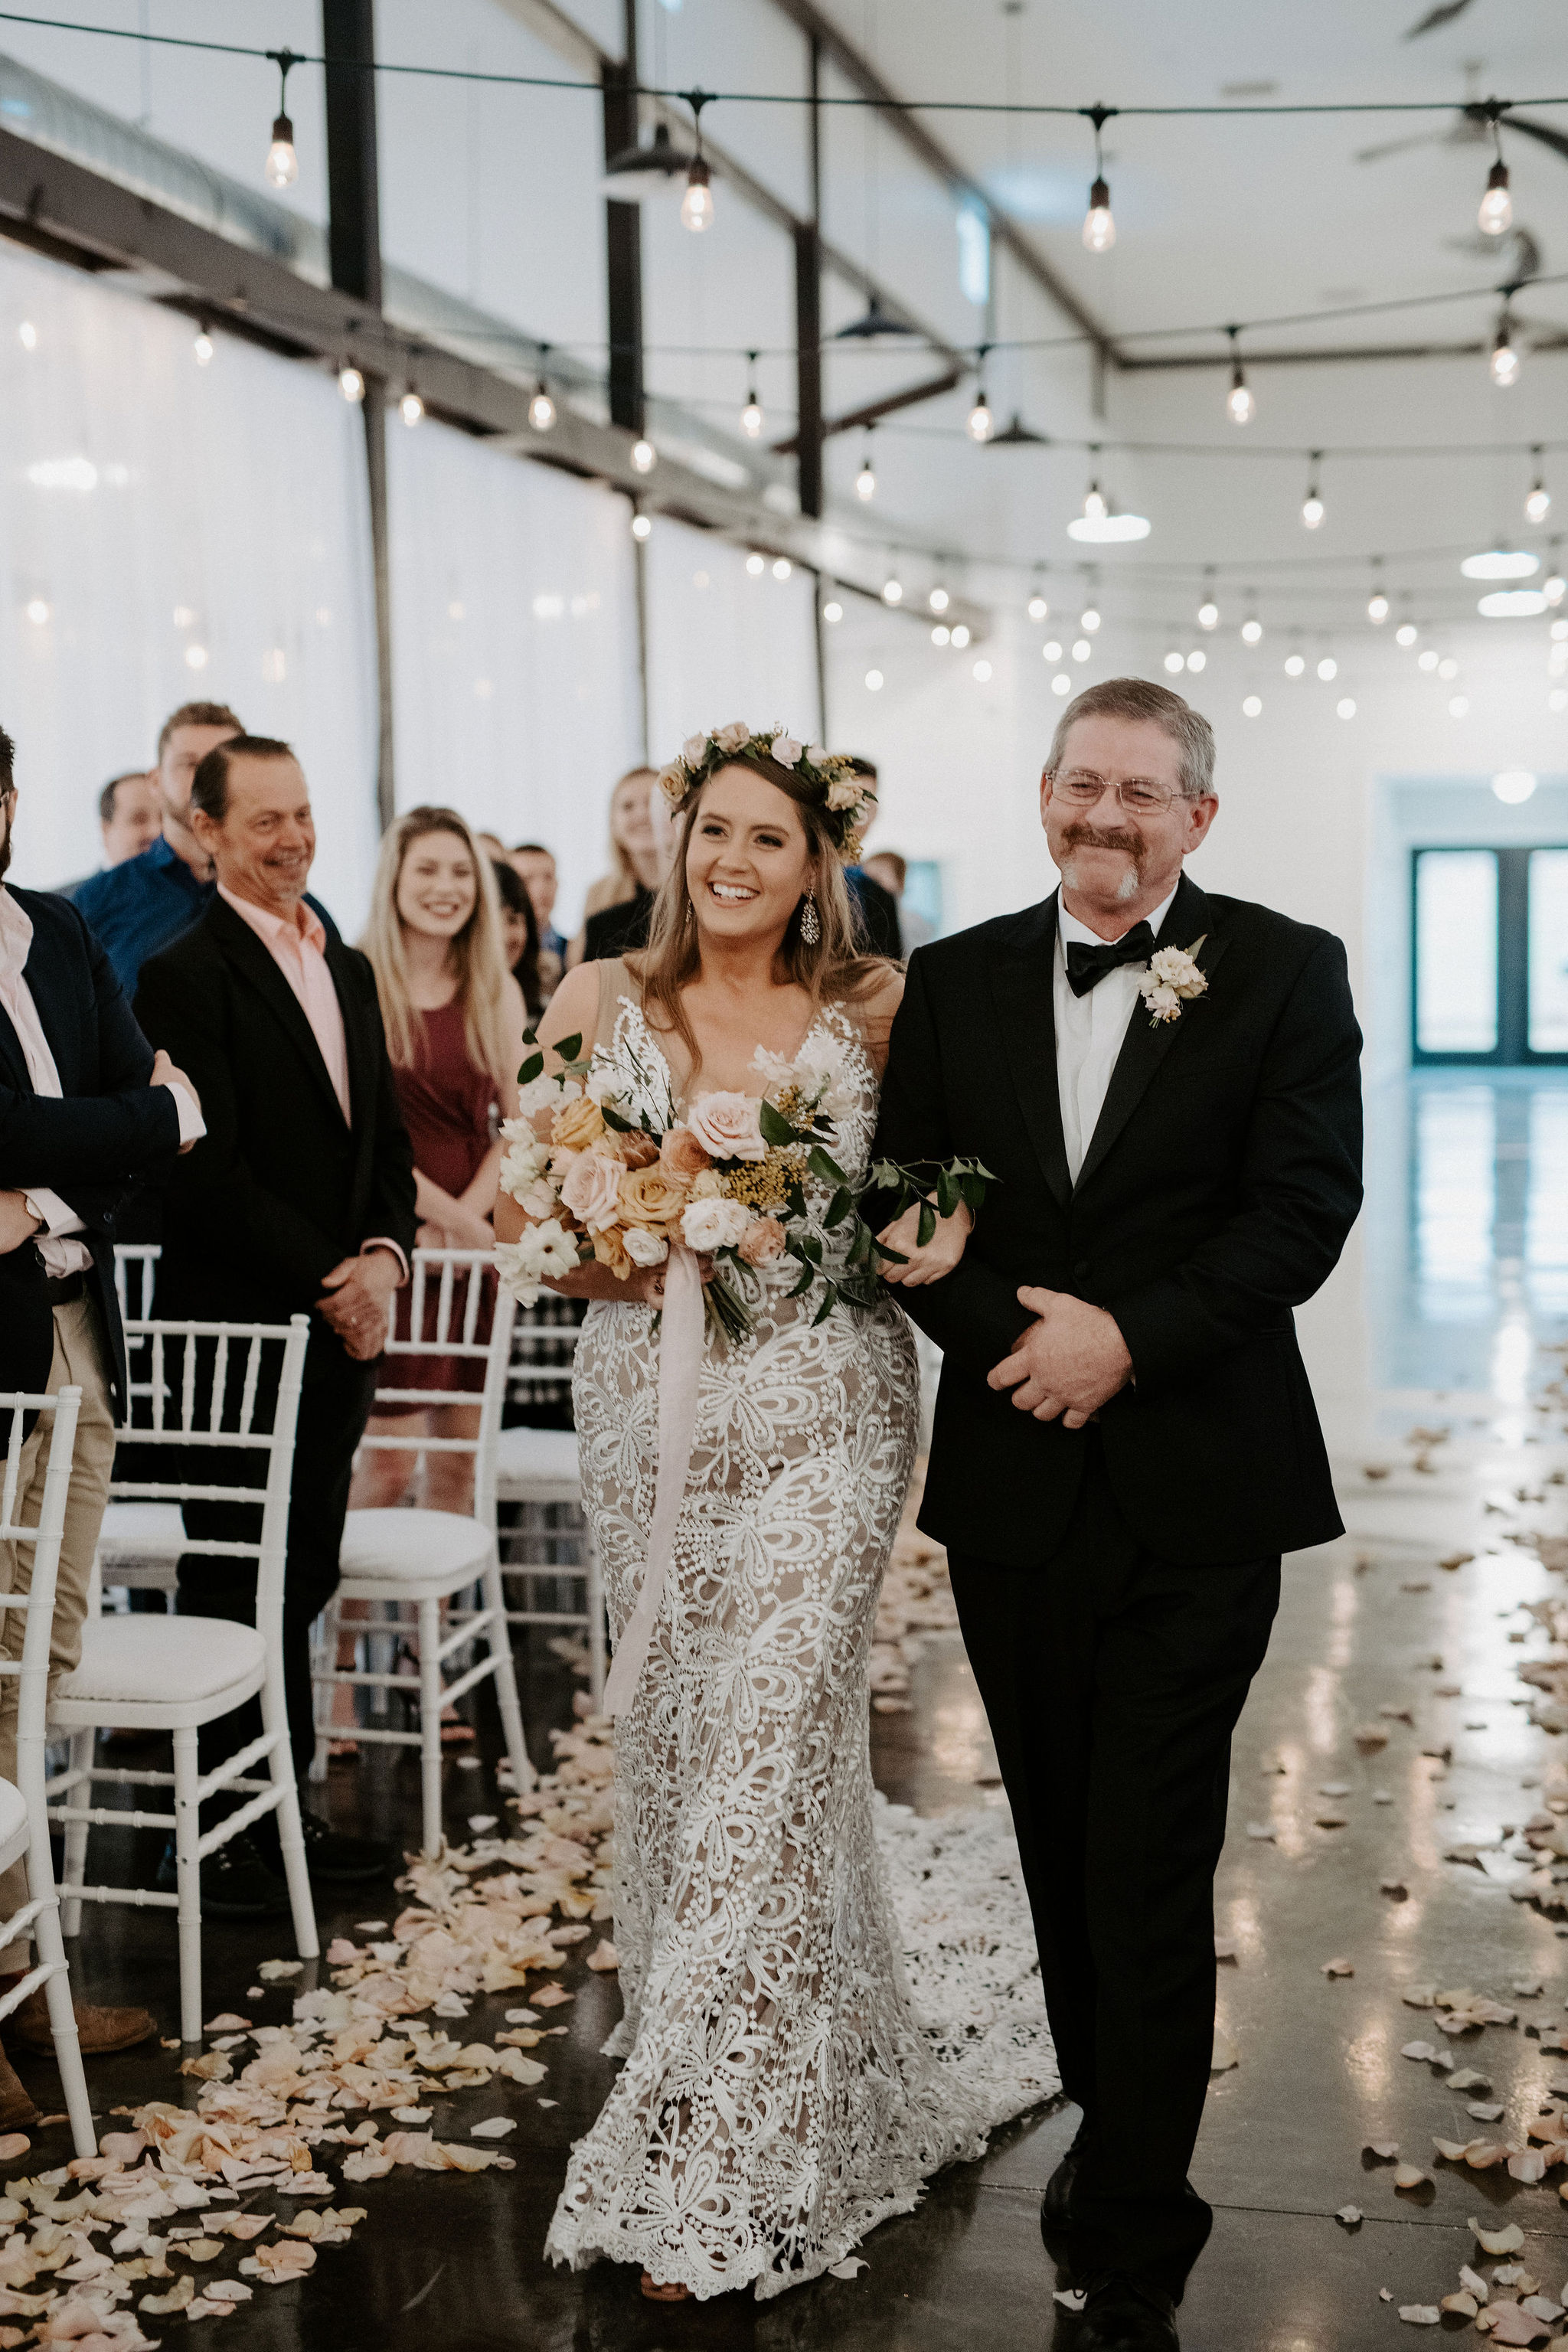 Dream Point Ranch Tulsa's White Barn Wedding Venue.jpg